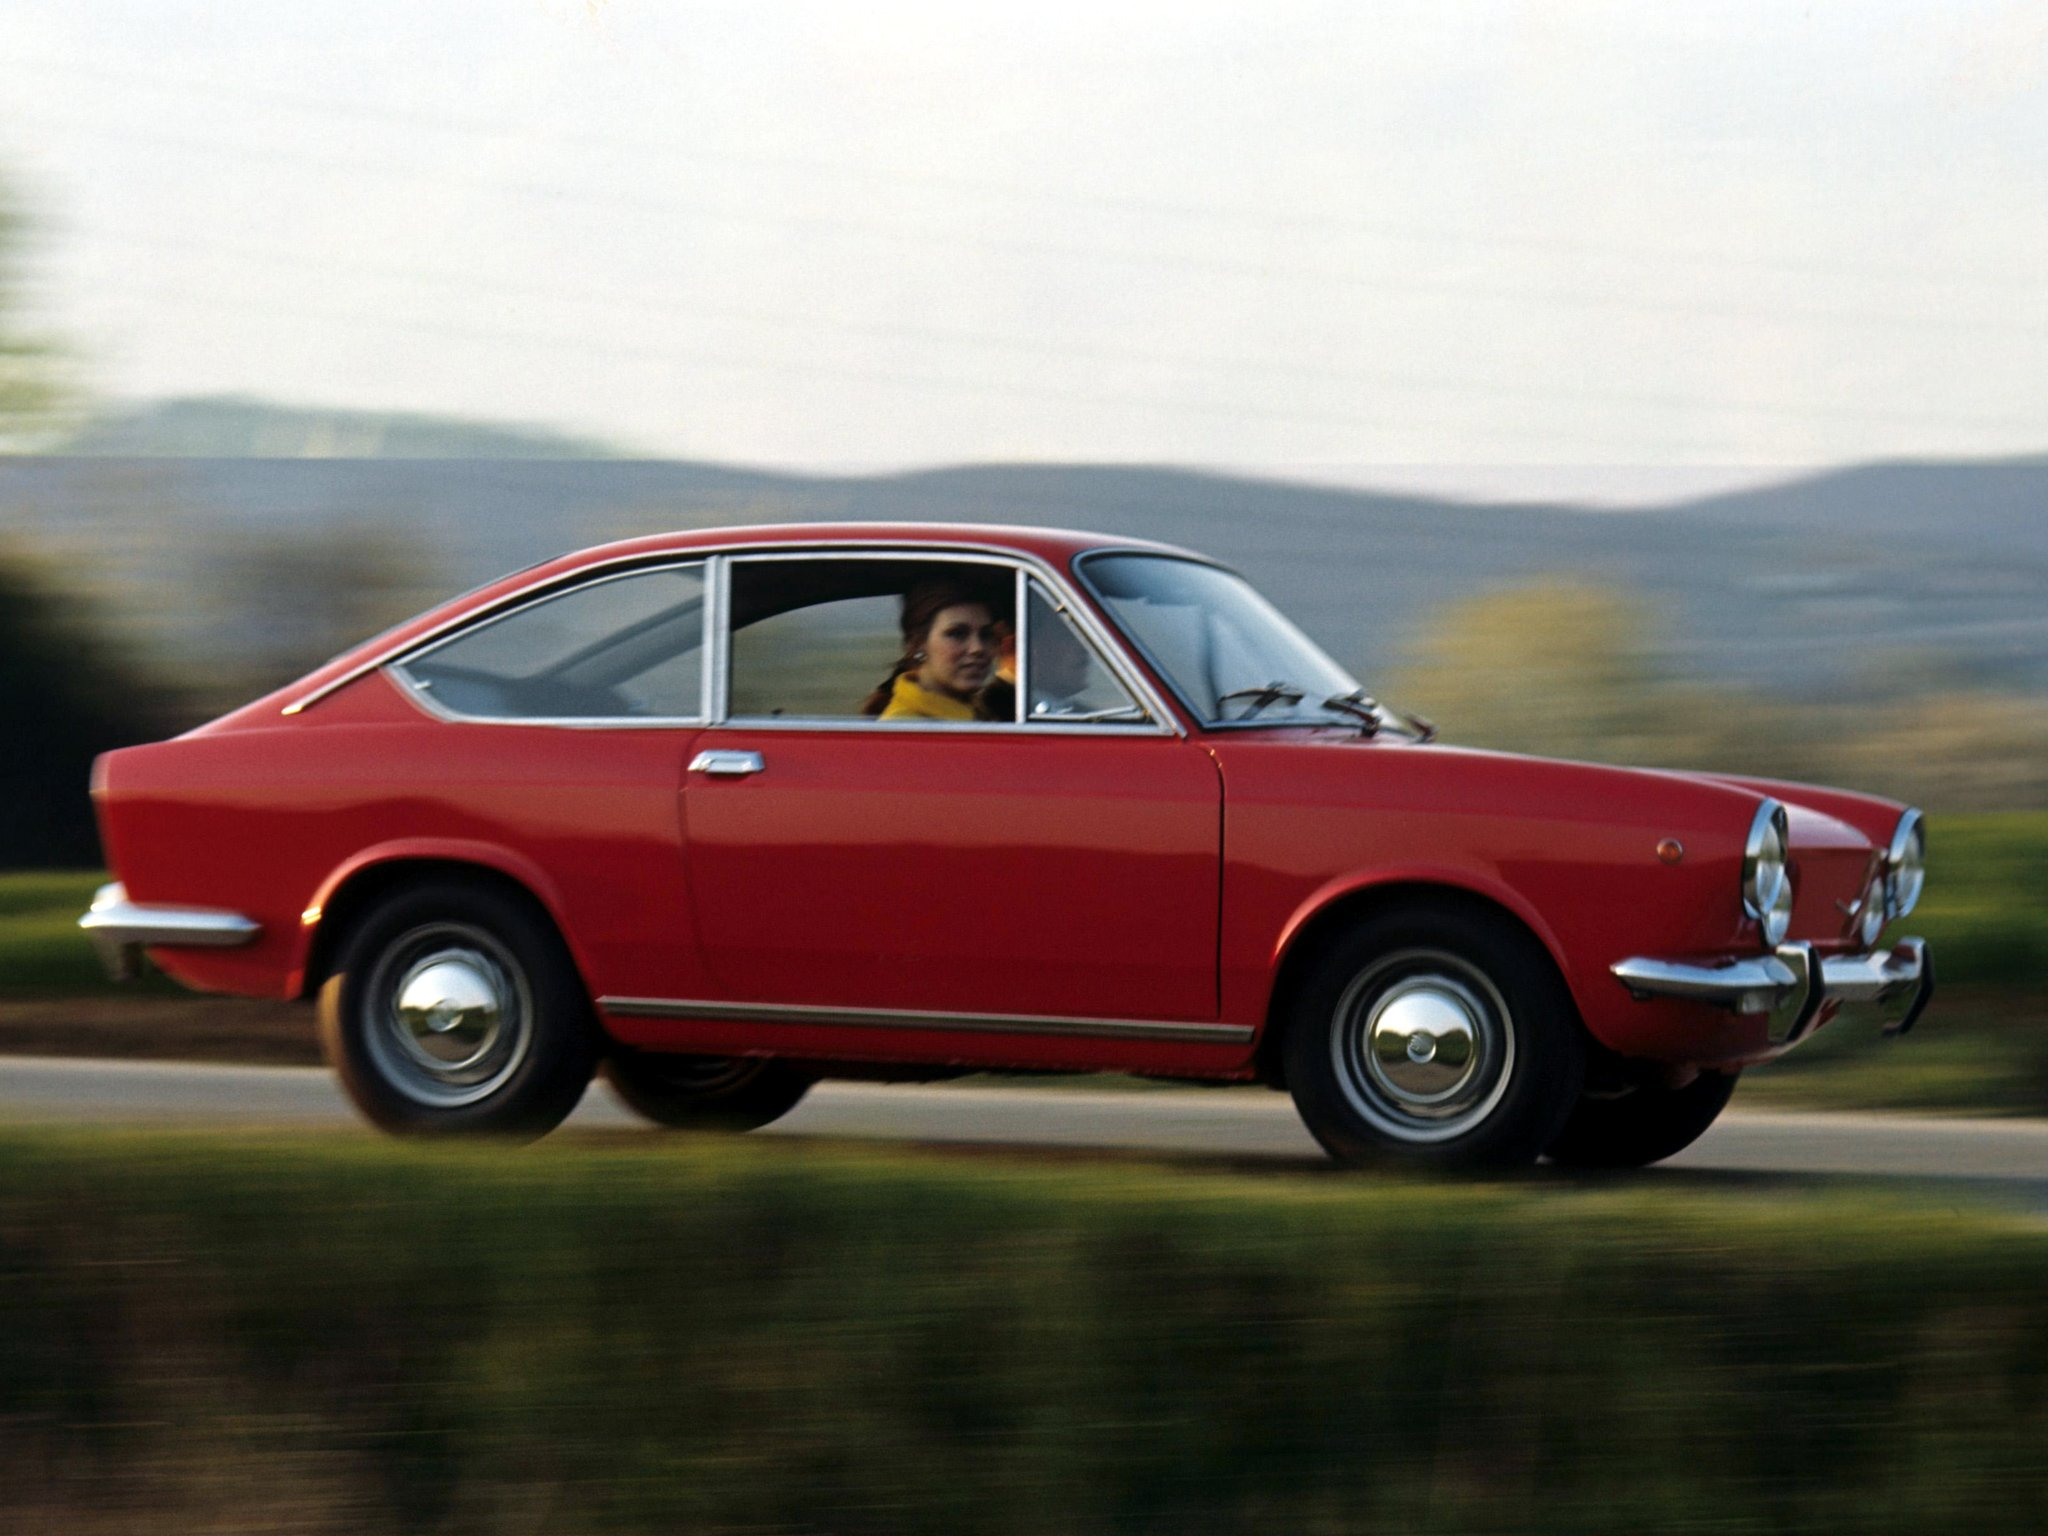 fiat 850 sport coupe classic cars italia wallpaper 2048x1536 604156 wallpaperup. Black Bedroom Furniture Sets. Home Design Ideas